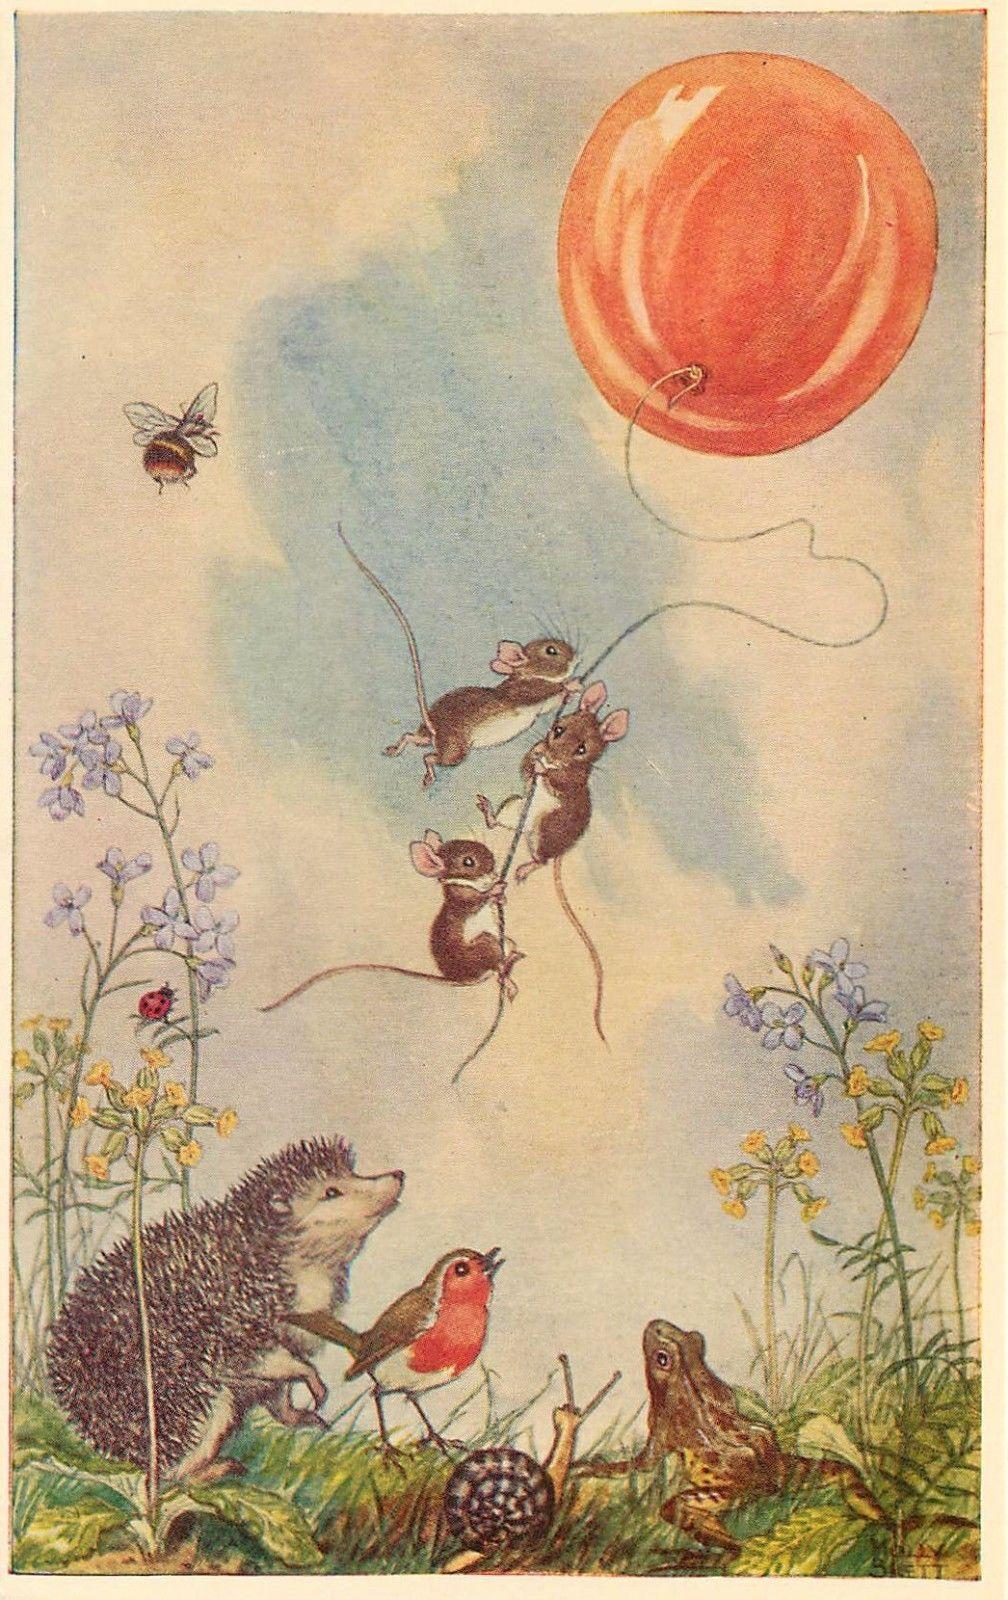 Medici Soc Postcard PK 314 The Balloon Goes Up A s Molly Brett Unposted | eBay